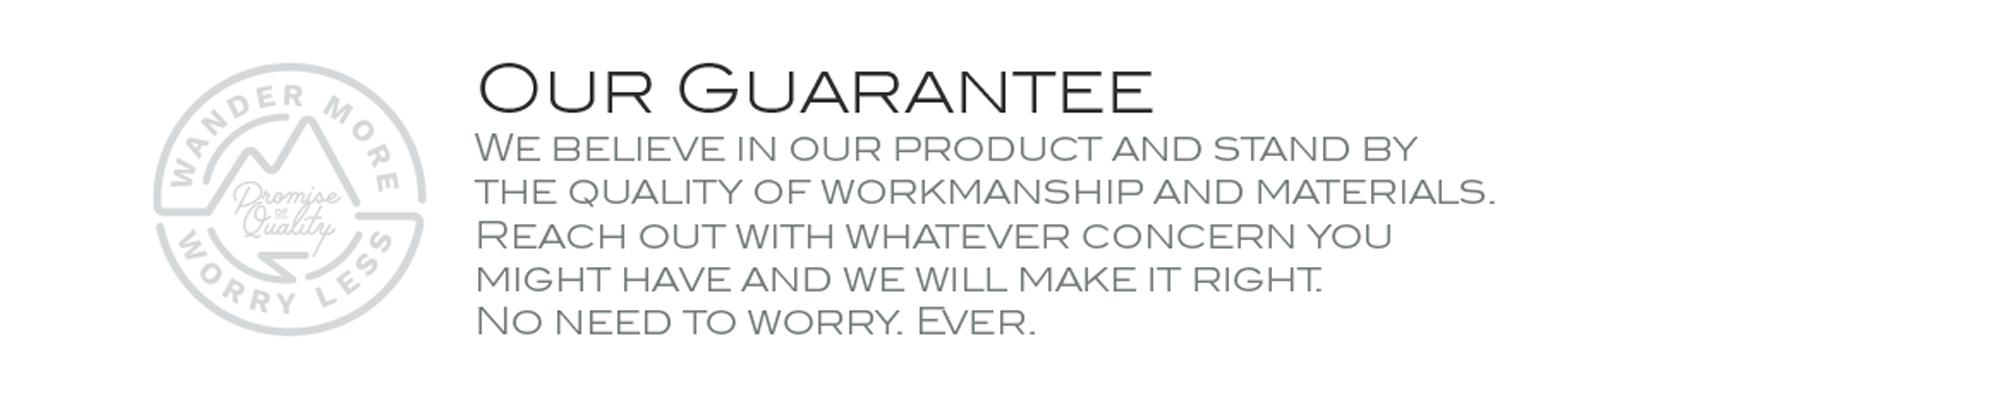 Wandrd All-new Prvke 21 Photo Bundle Essential Backpack - Lifetime Reliability Guarantee